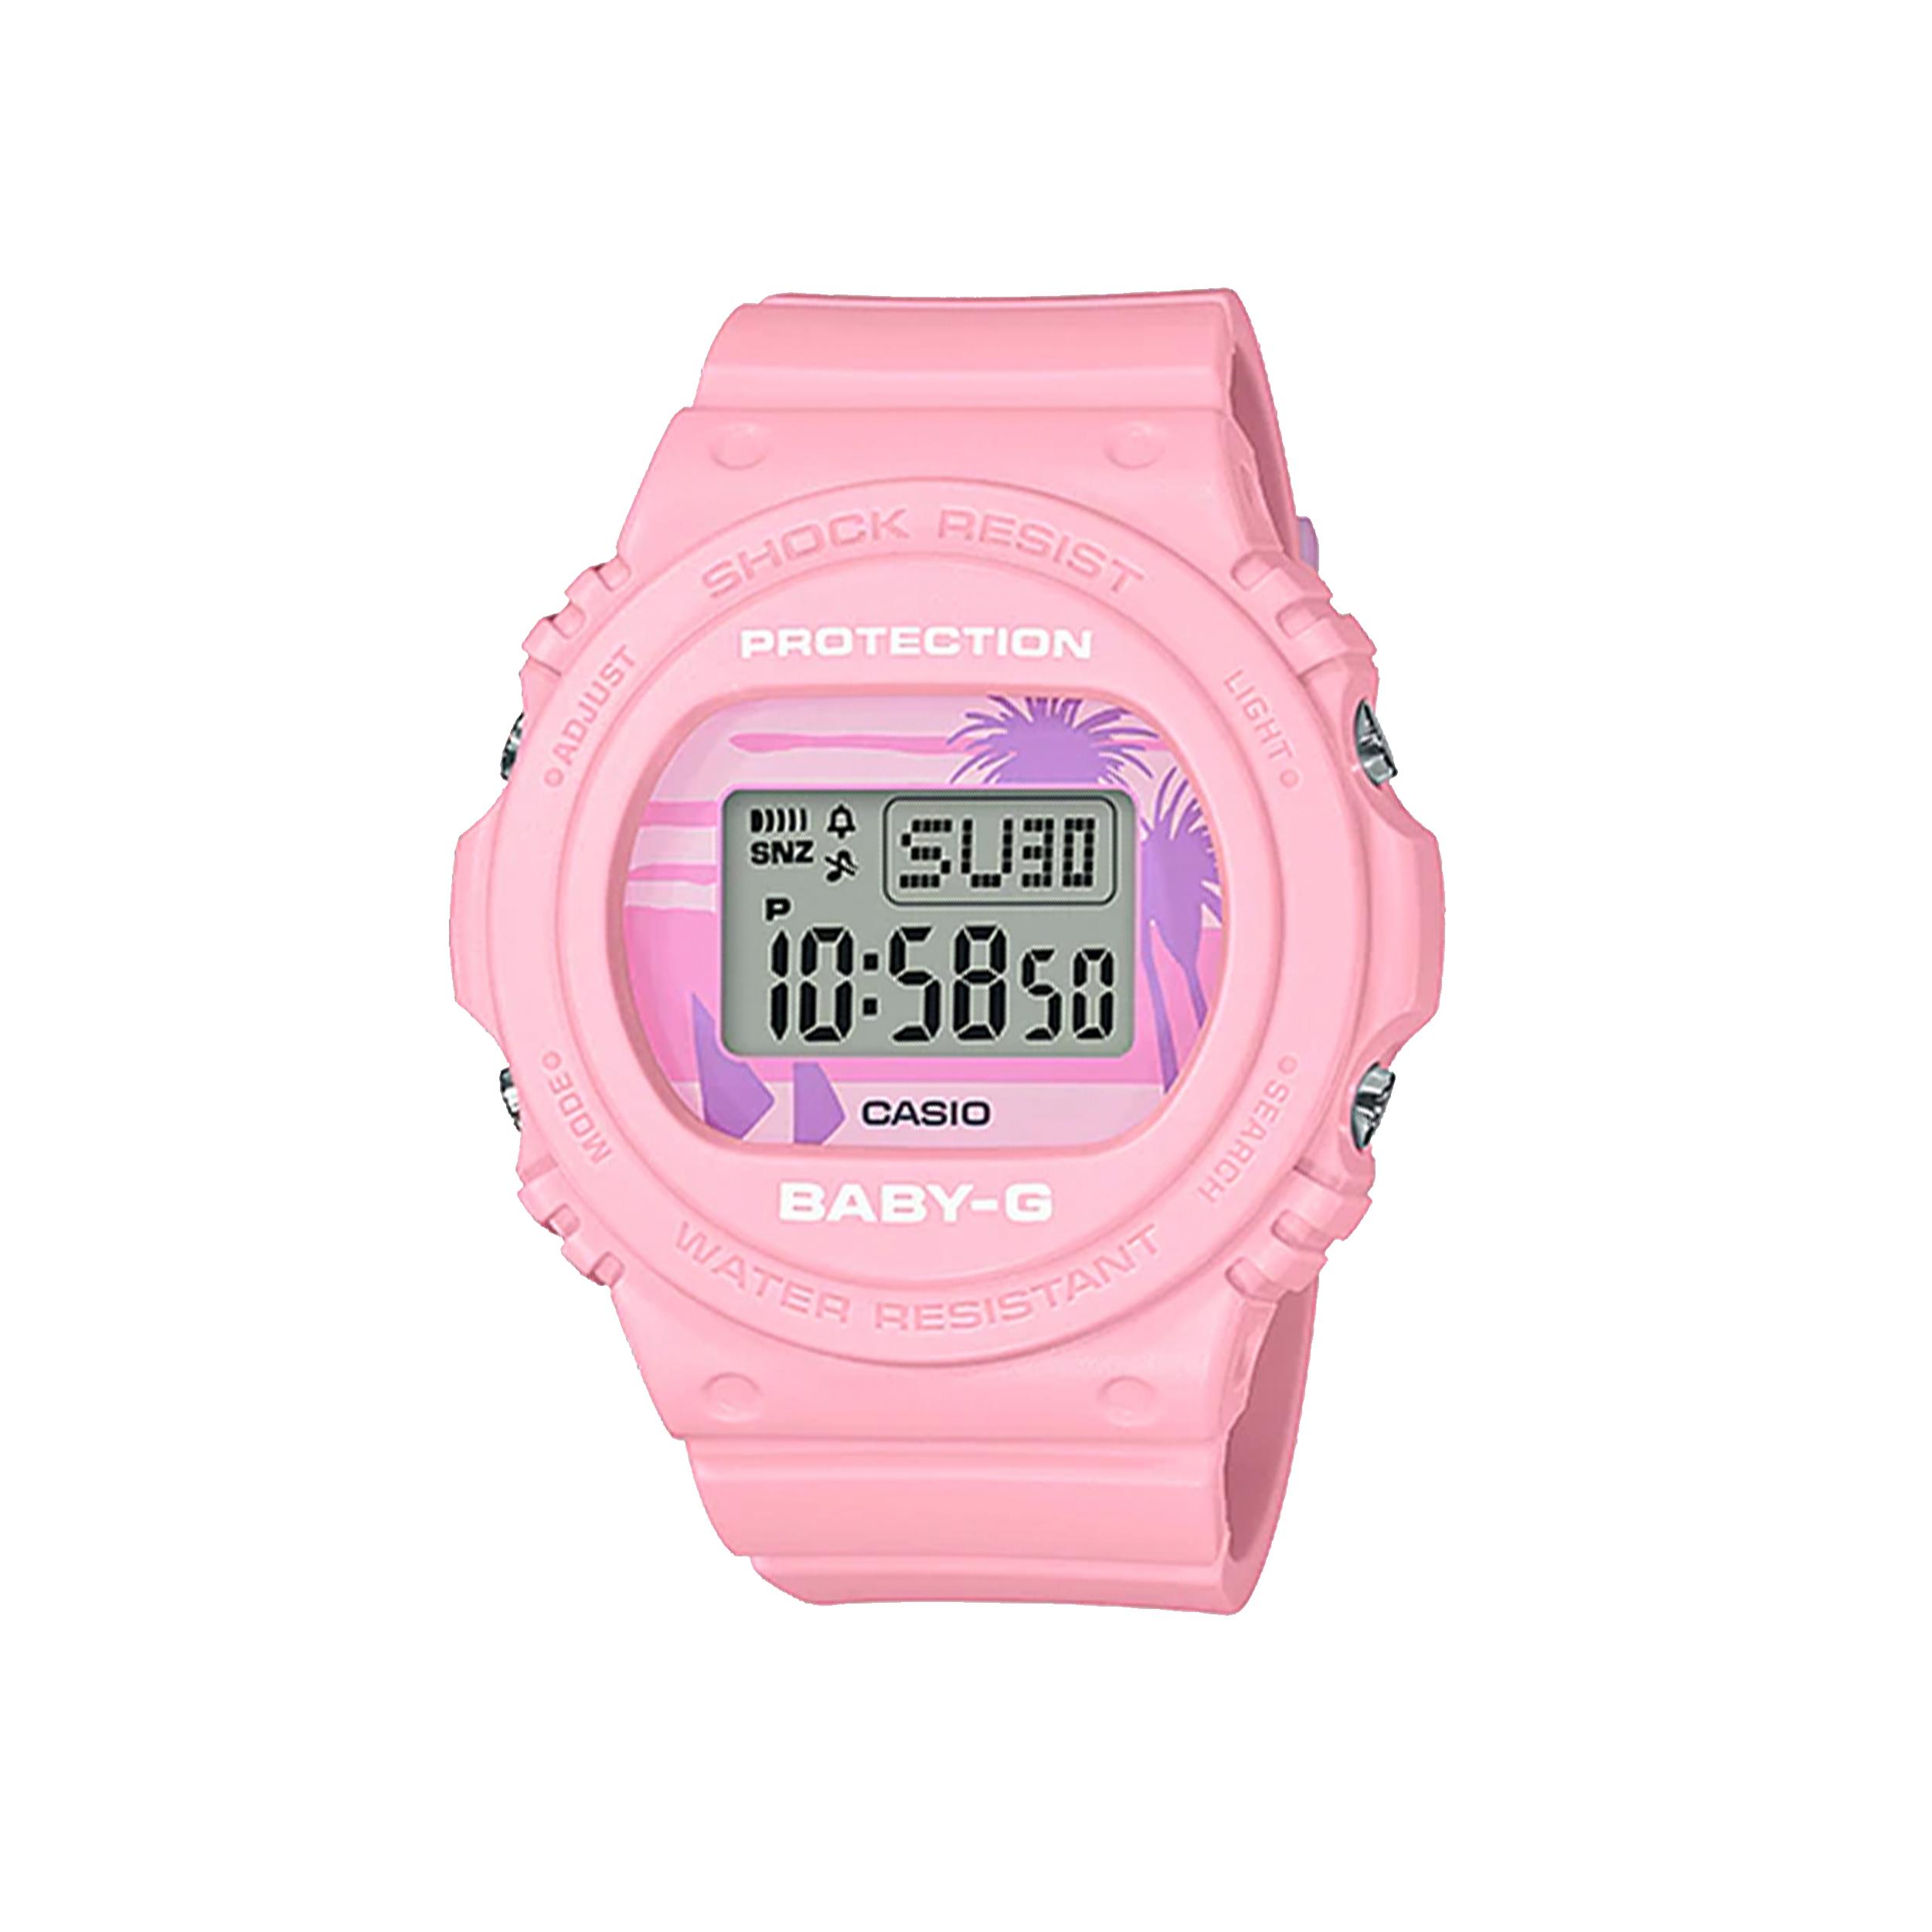 ساعت مچی دیجیتال زنانه کاسیو مدل BGD-570BC-4DR